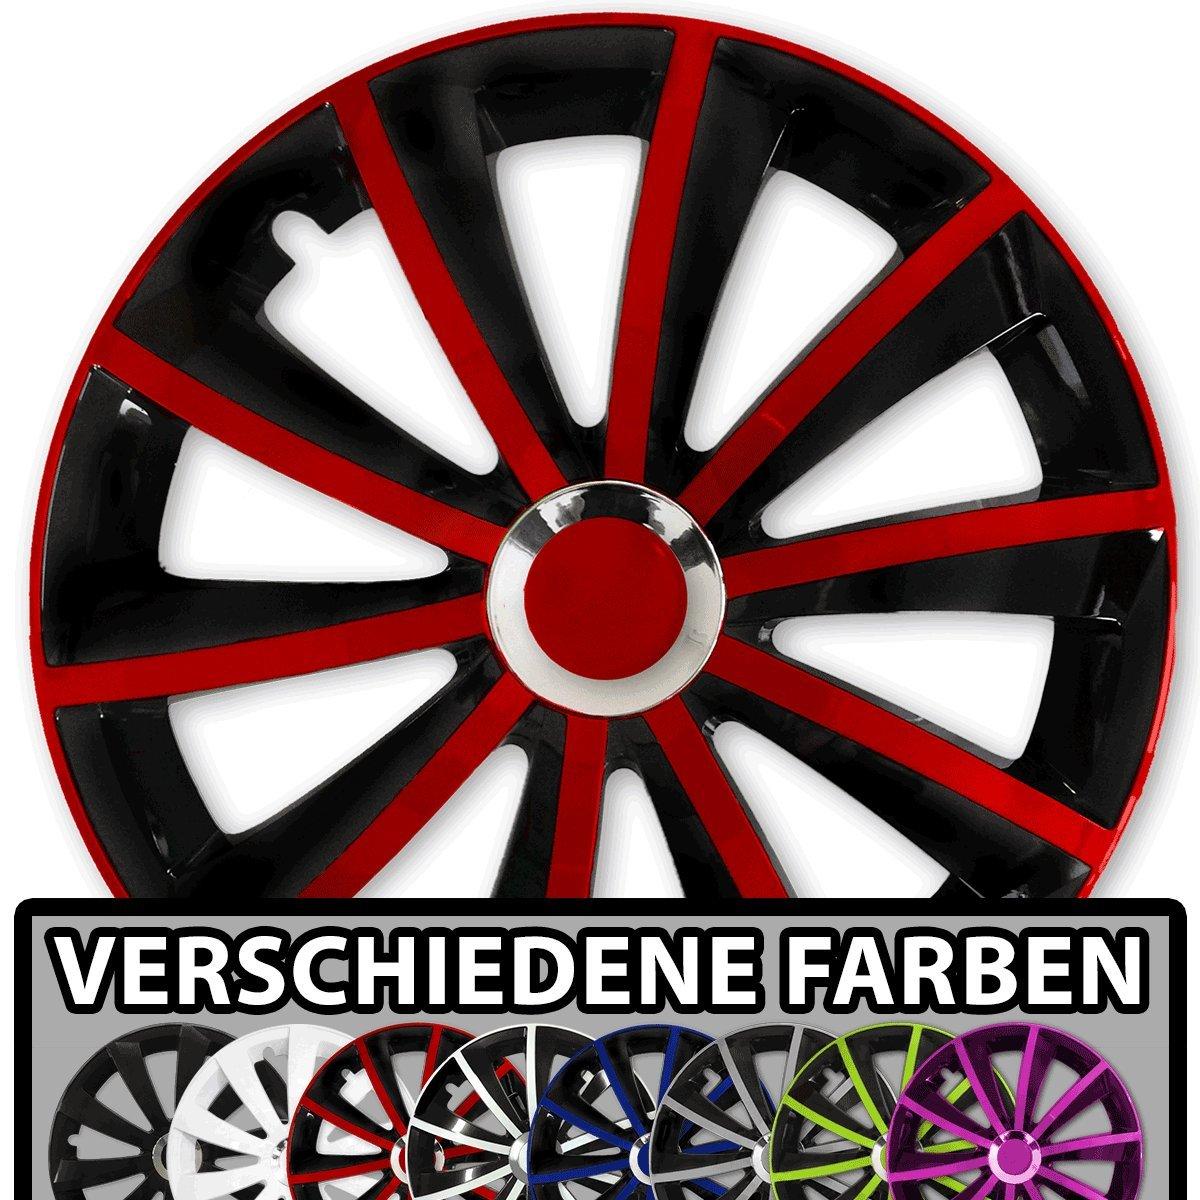 KOPPELSTANGE HINTEN PASST FÜR JEEP GRAND CHEROKEE WH 05-10 DODGE RAM 5500 08-09